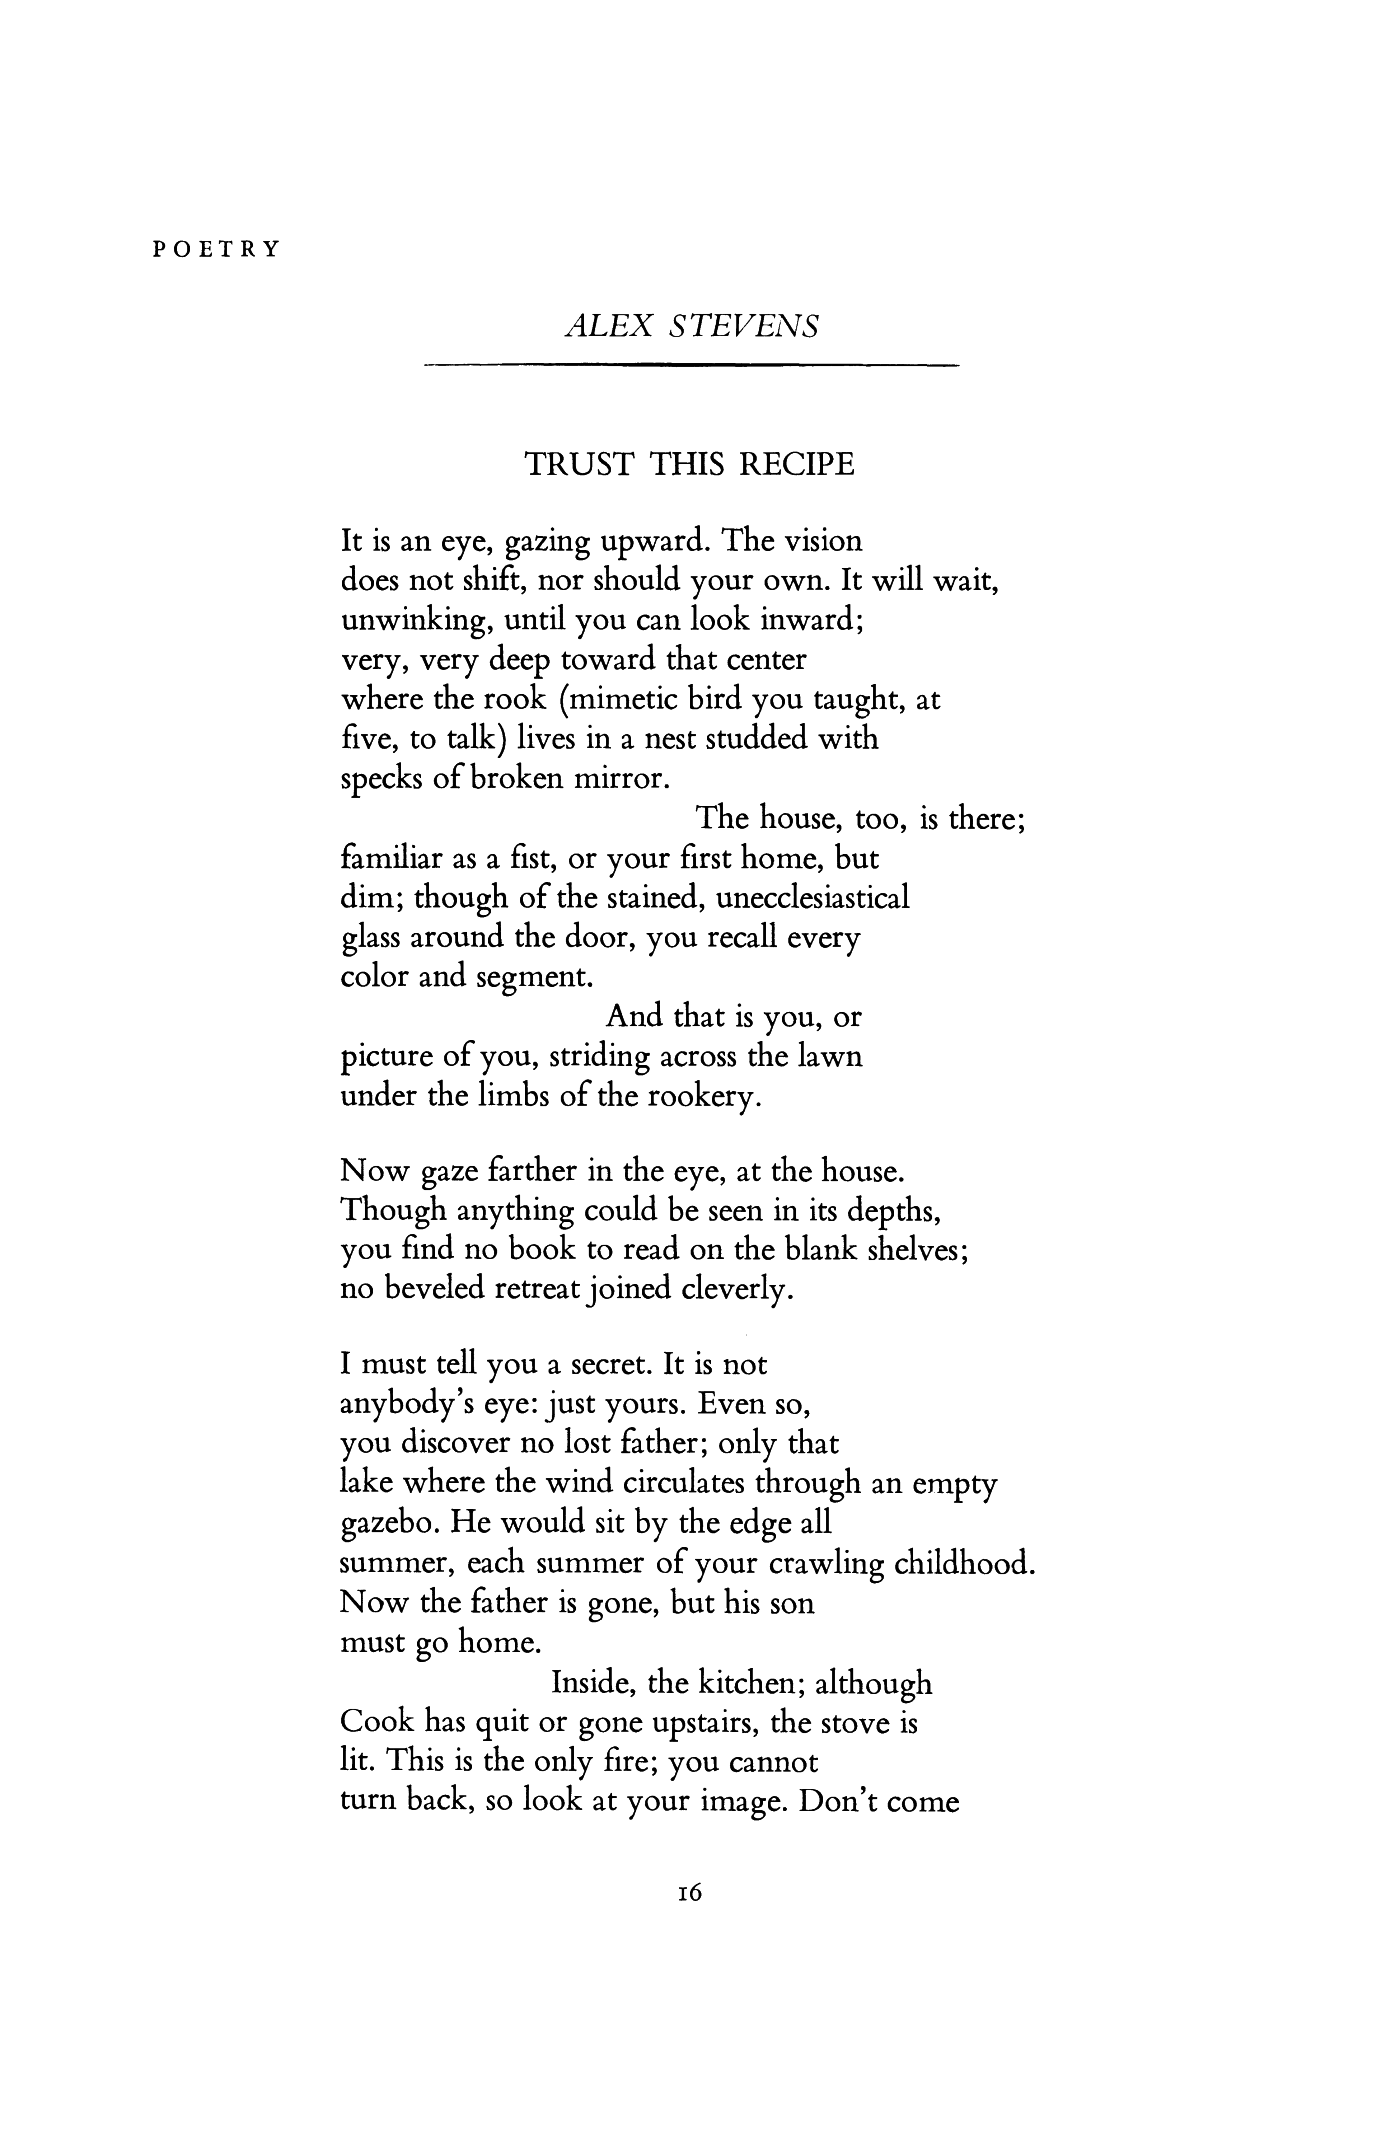 Trust This Recipe By Alex Stevens Poetry Magazine